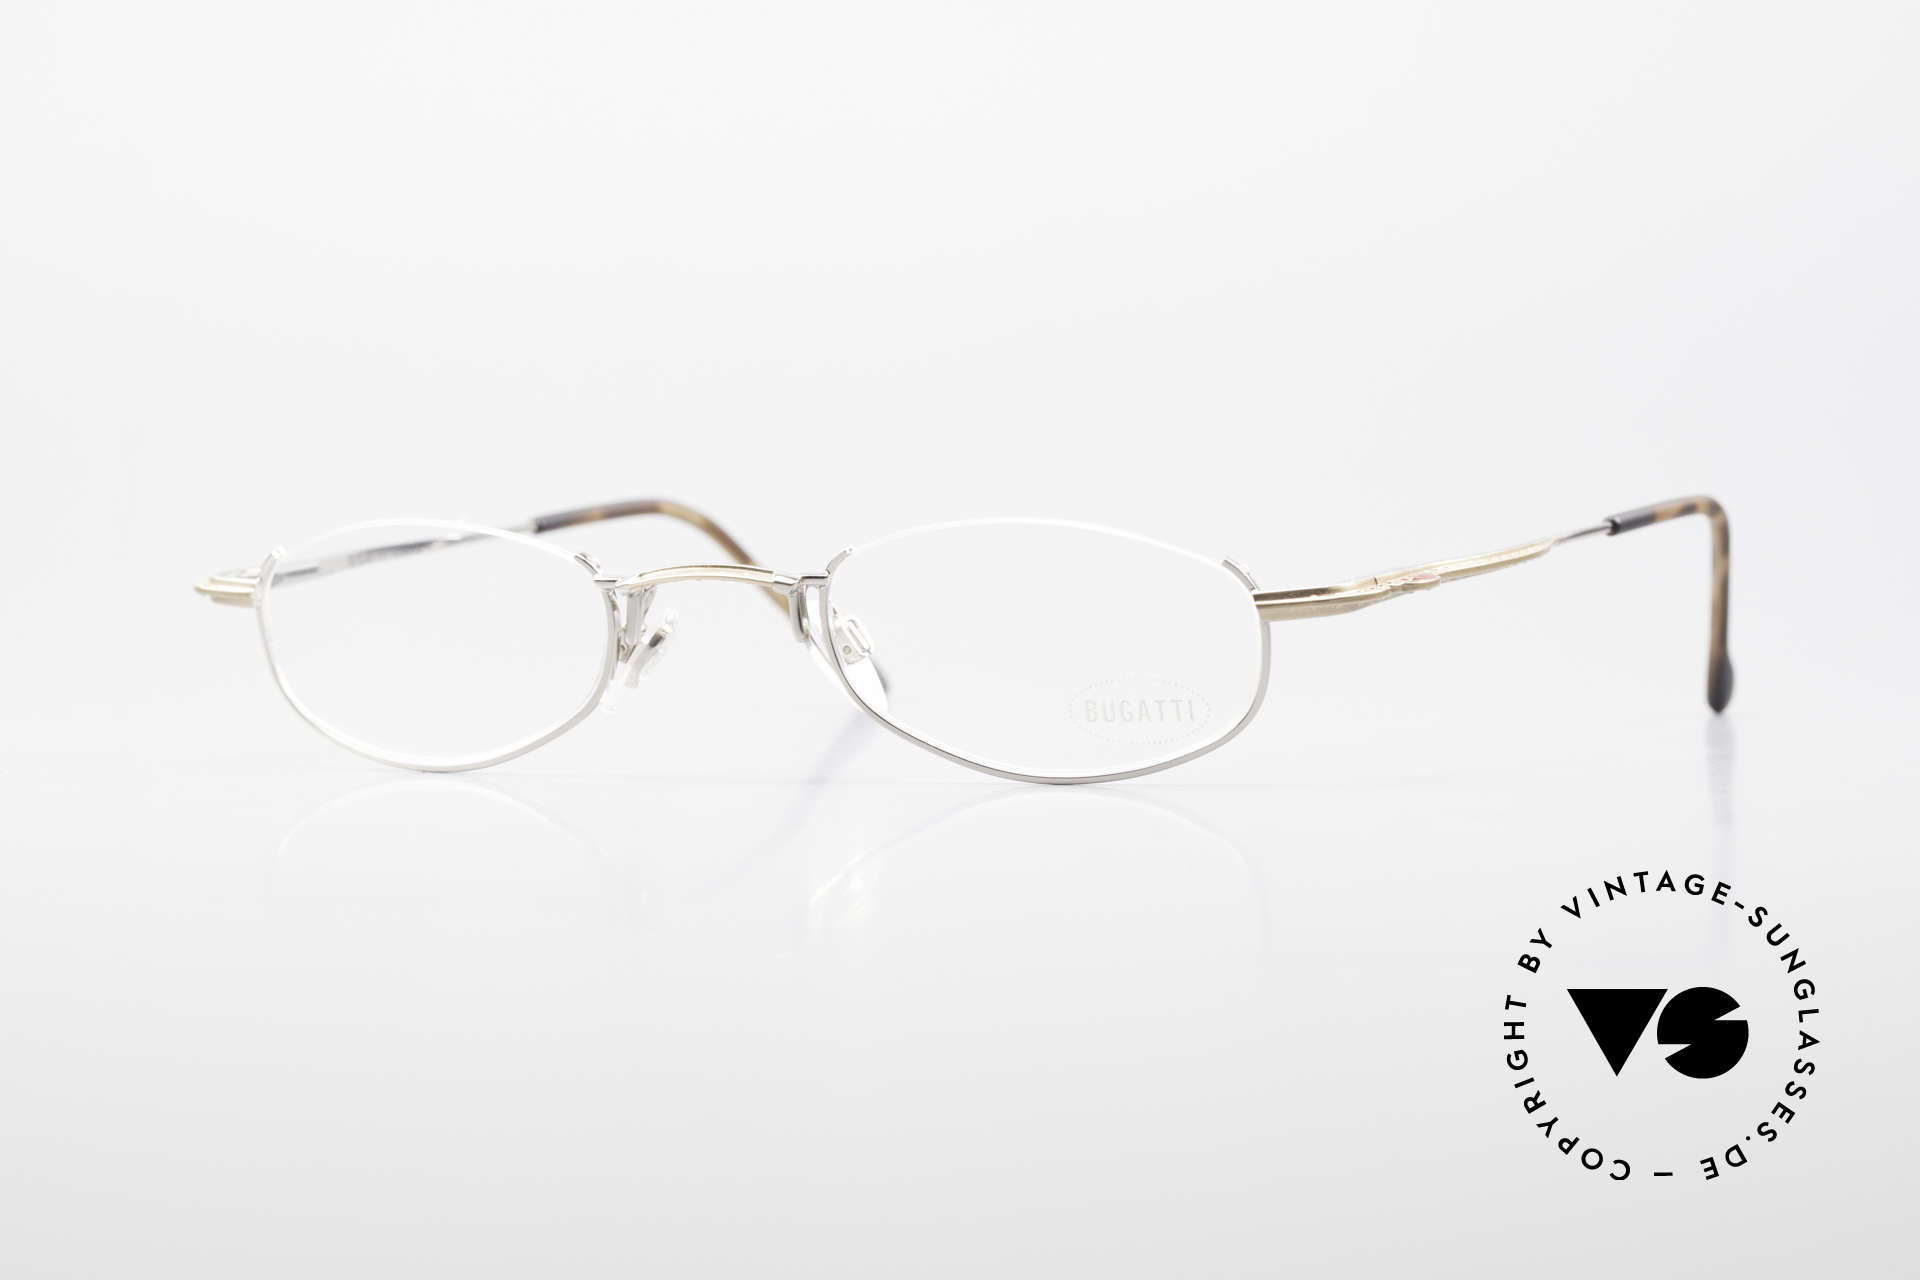 Bugatti 23668 High-Tech Reading Eyeglasses, original, vintage reading eyeglass-frame by Bugatti, Made for Men